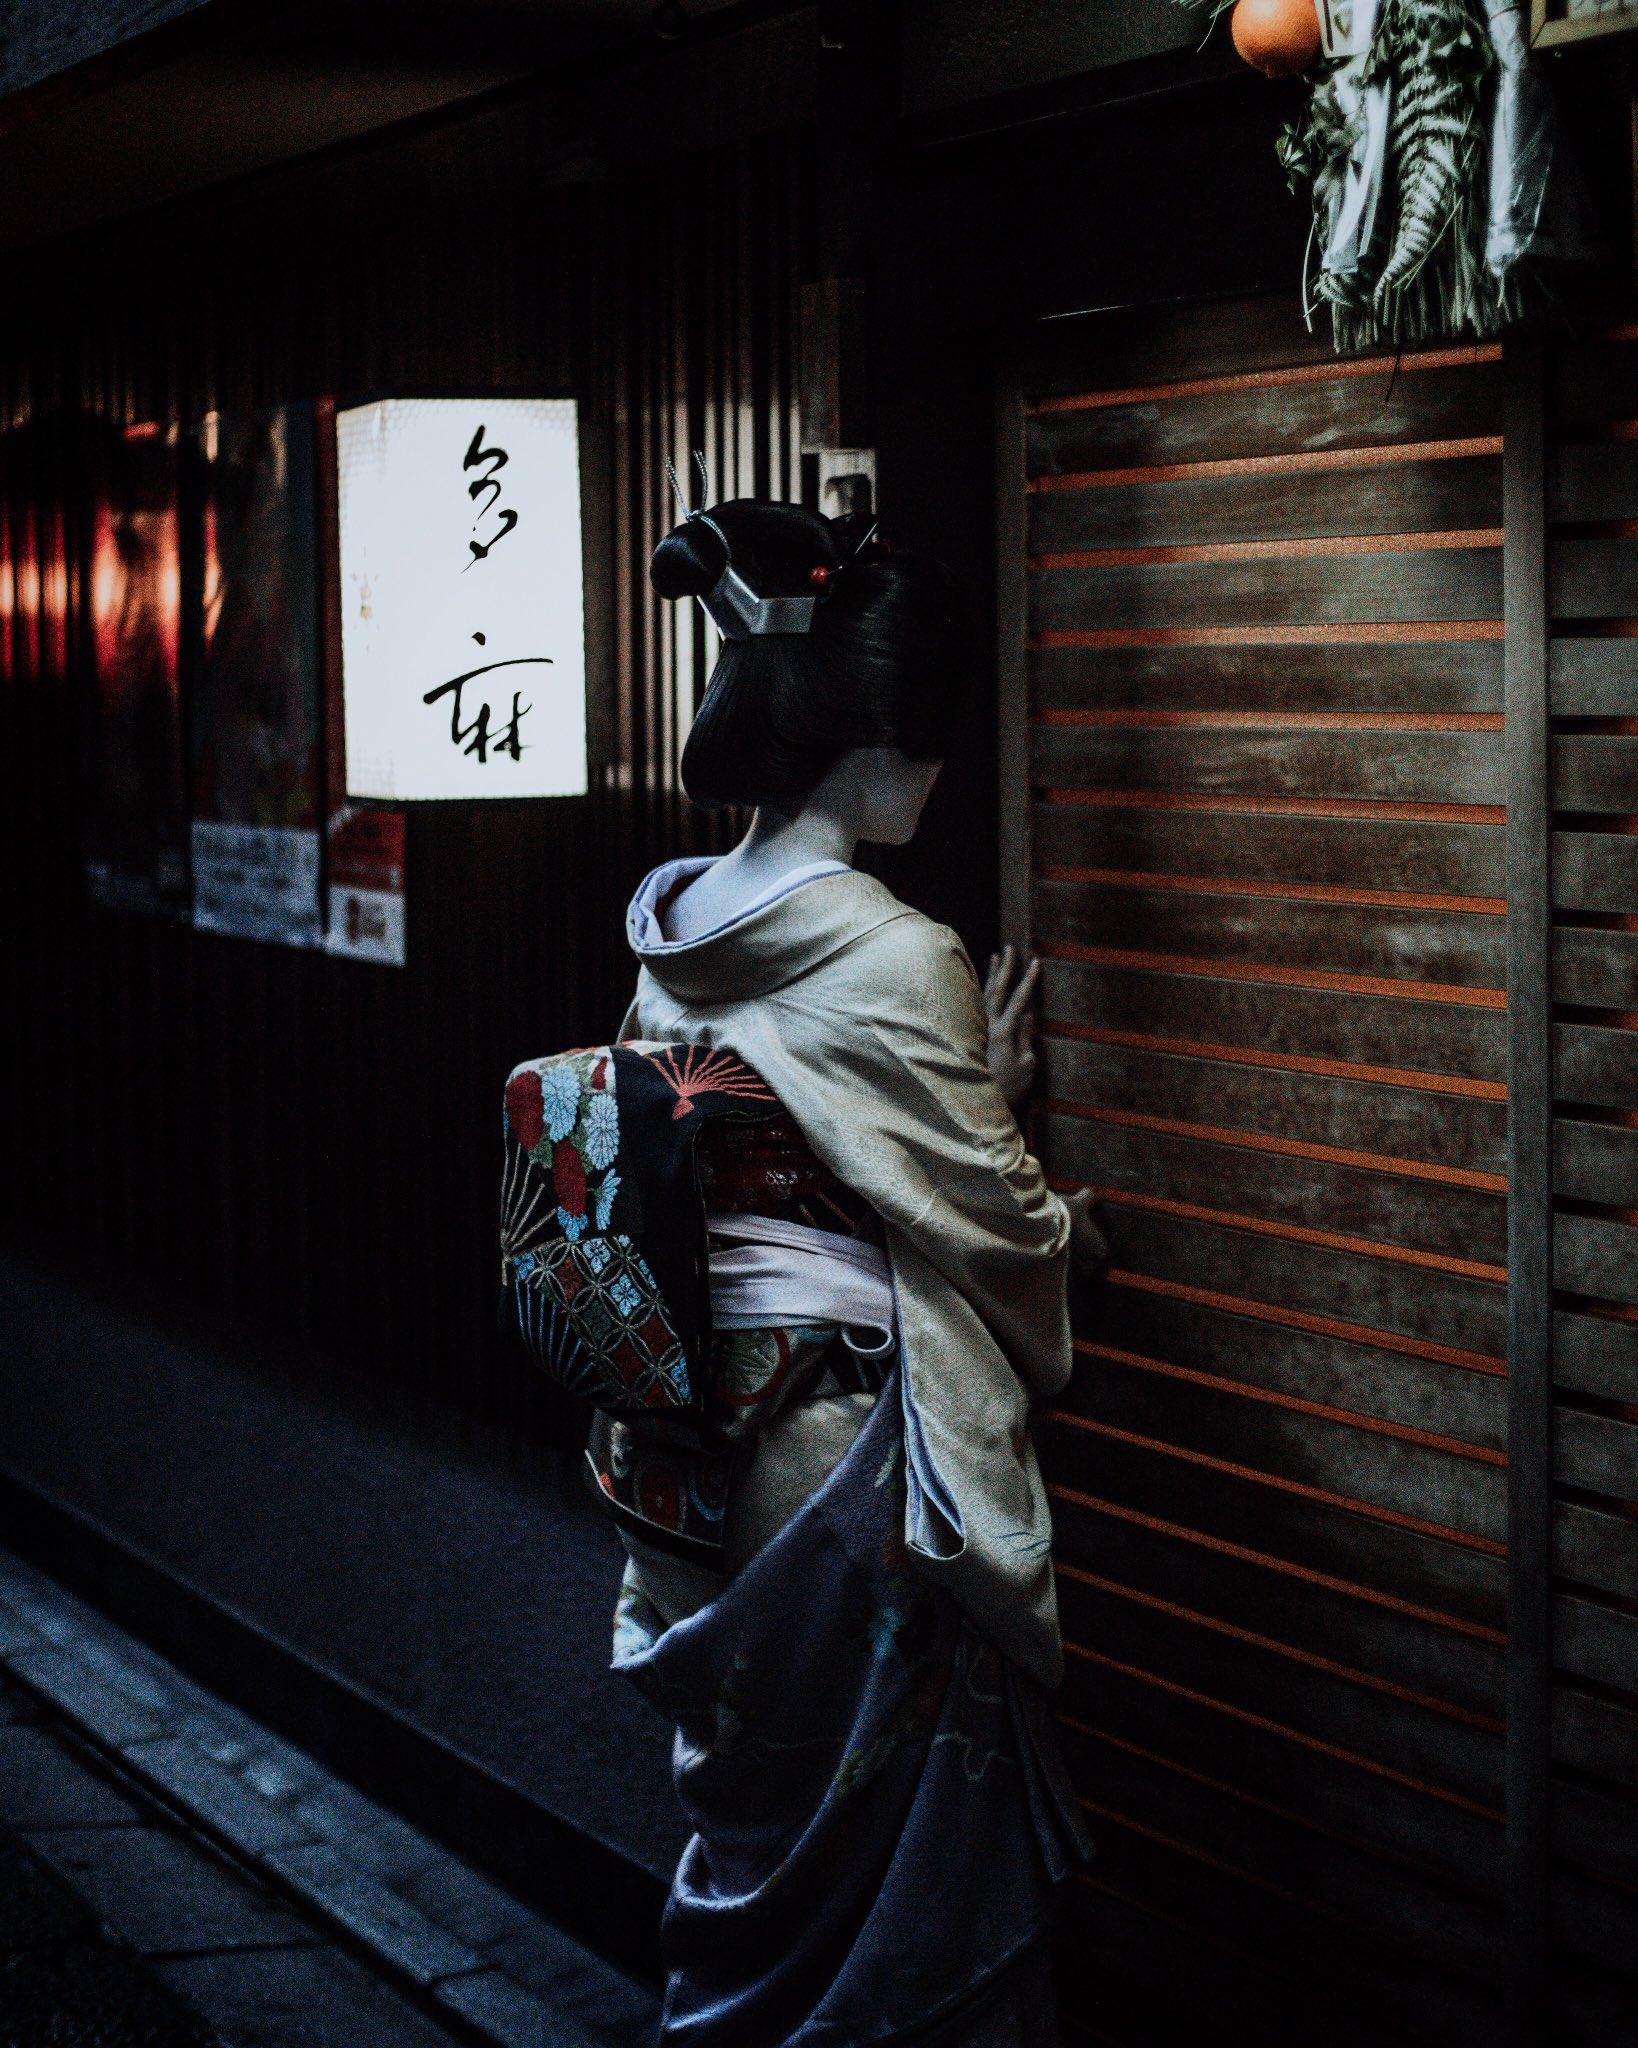 candid_street_photography_10.jpg